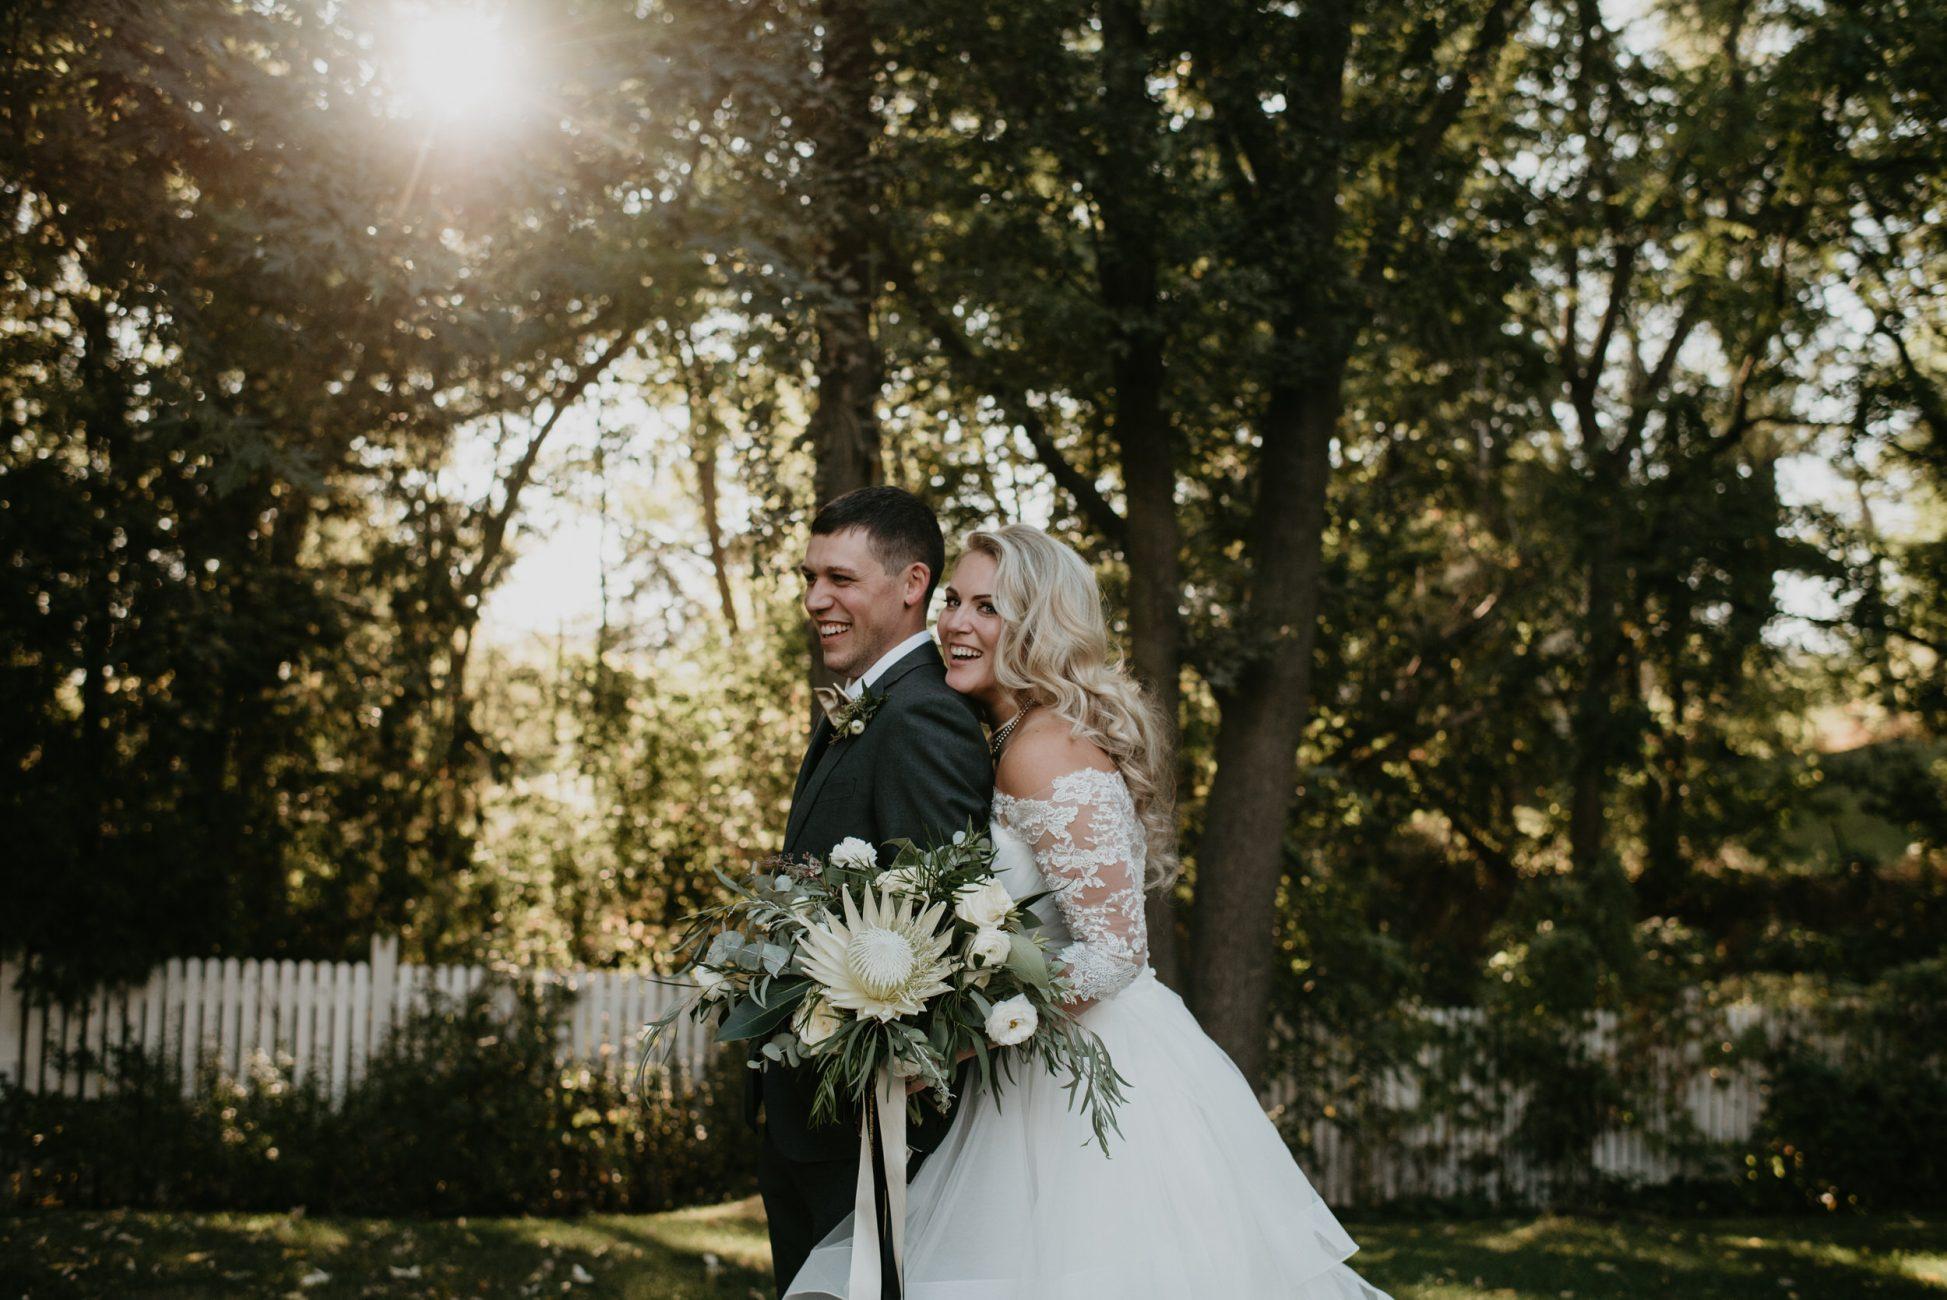 Barrie Wedding Planner, Barrie Wedding Coordinator, Barrie Wedding Designer, Wedding Planner, Wedding Designer, Toronto Wedding Planner, Muskoka Wedding Planner, wedding design, barrie, barrie weddings,